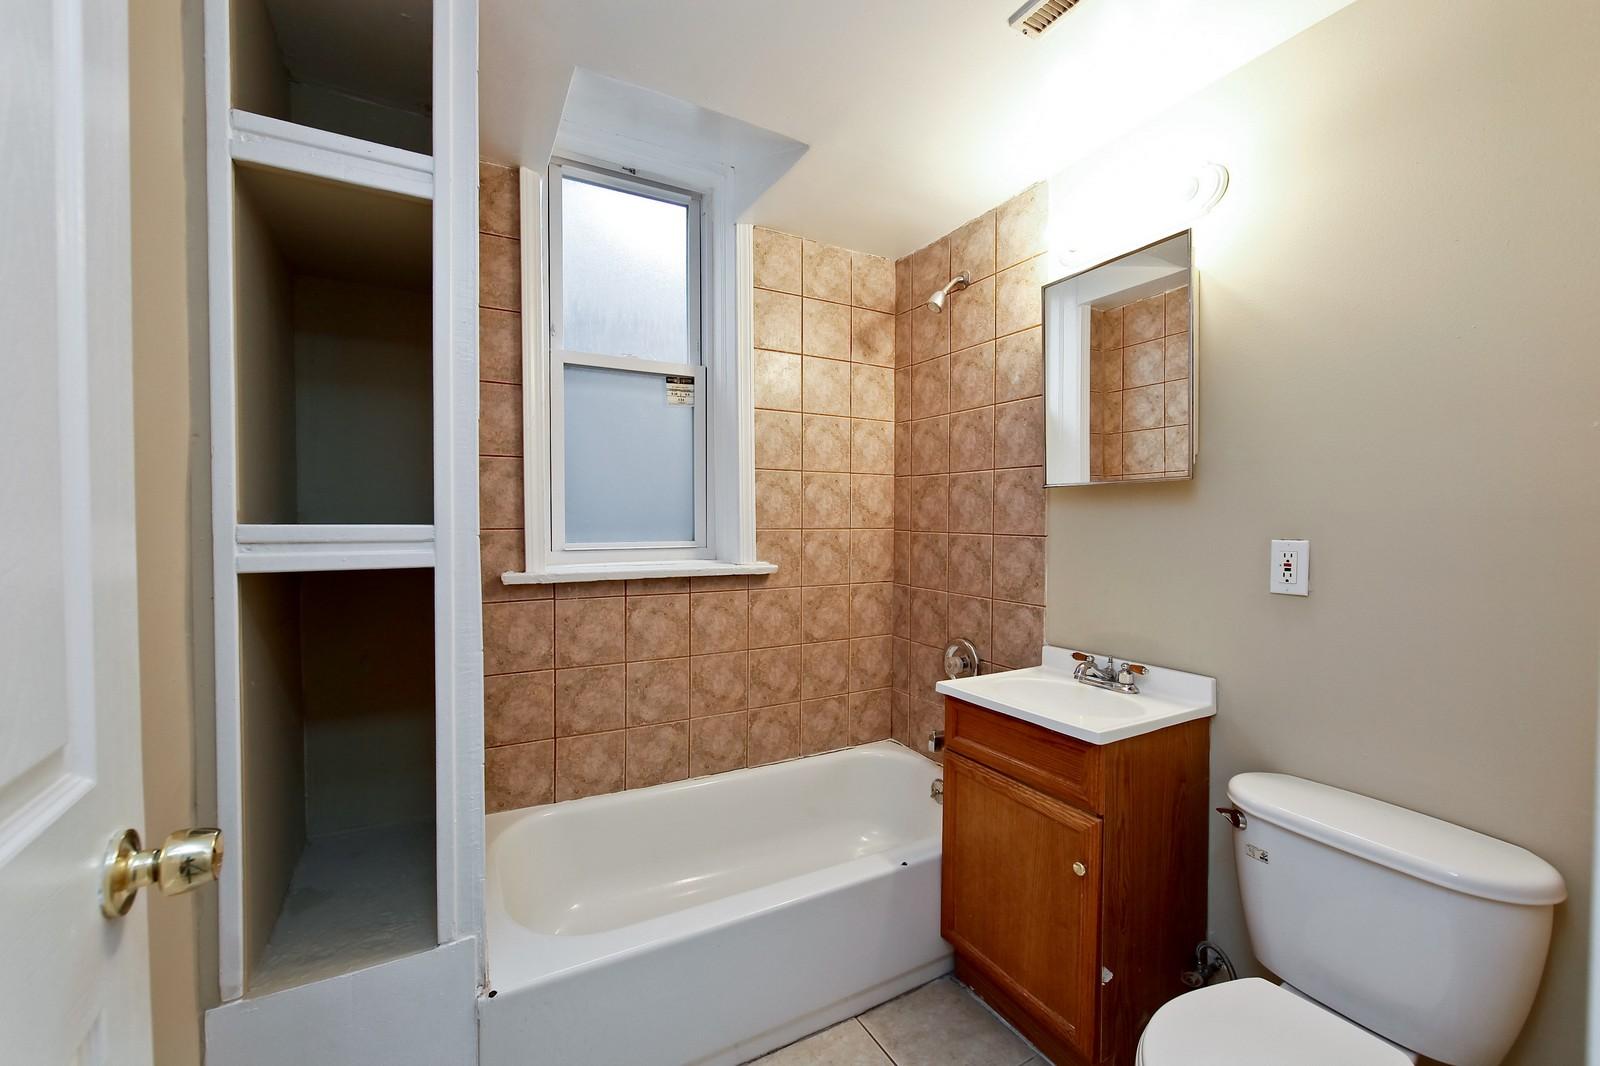 Real Estate Photography - 3332 W Polk St, Chicago, IL, 60624 - Bathroom